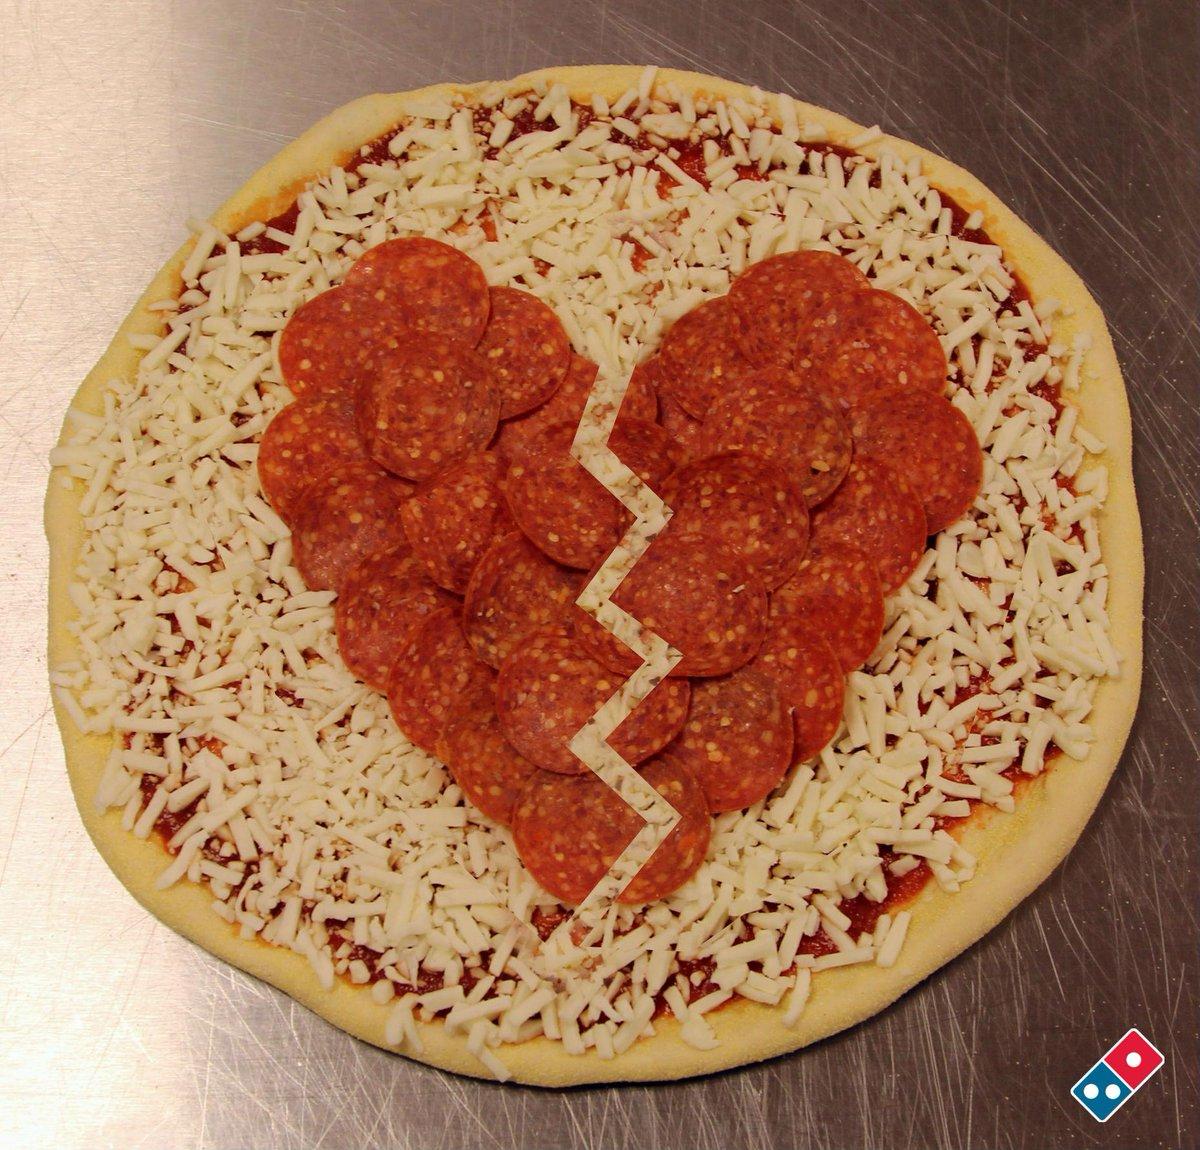 That moment when even pizza won't cure your #ZaynPain. http://t.co/k4B1ILmEZ1